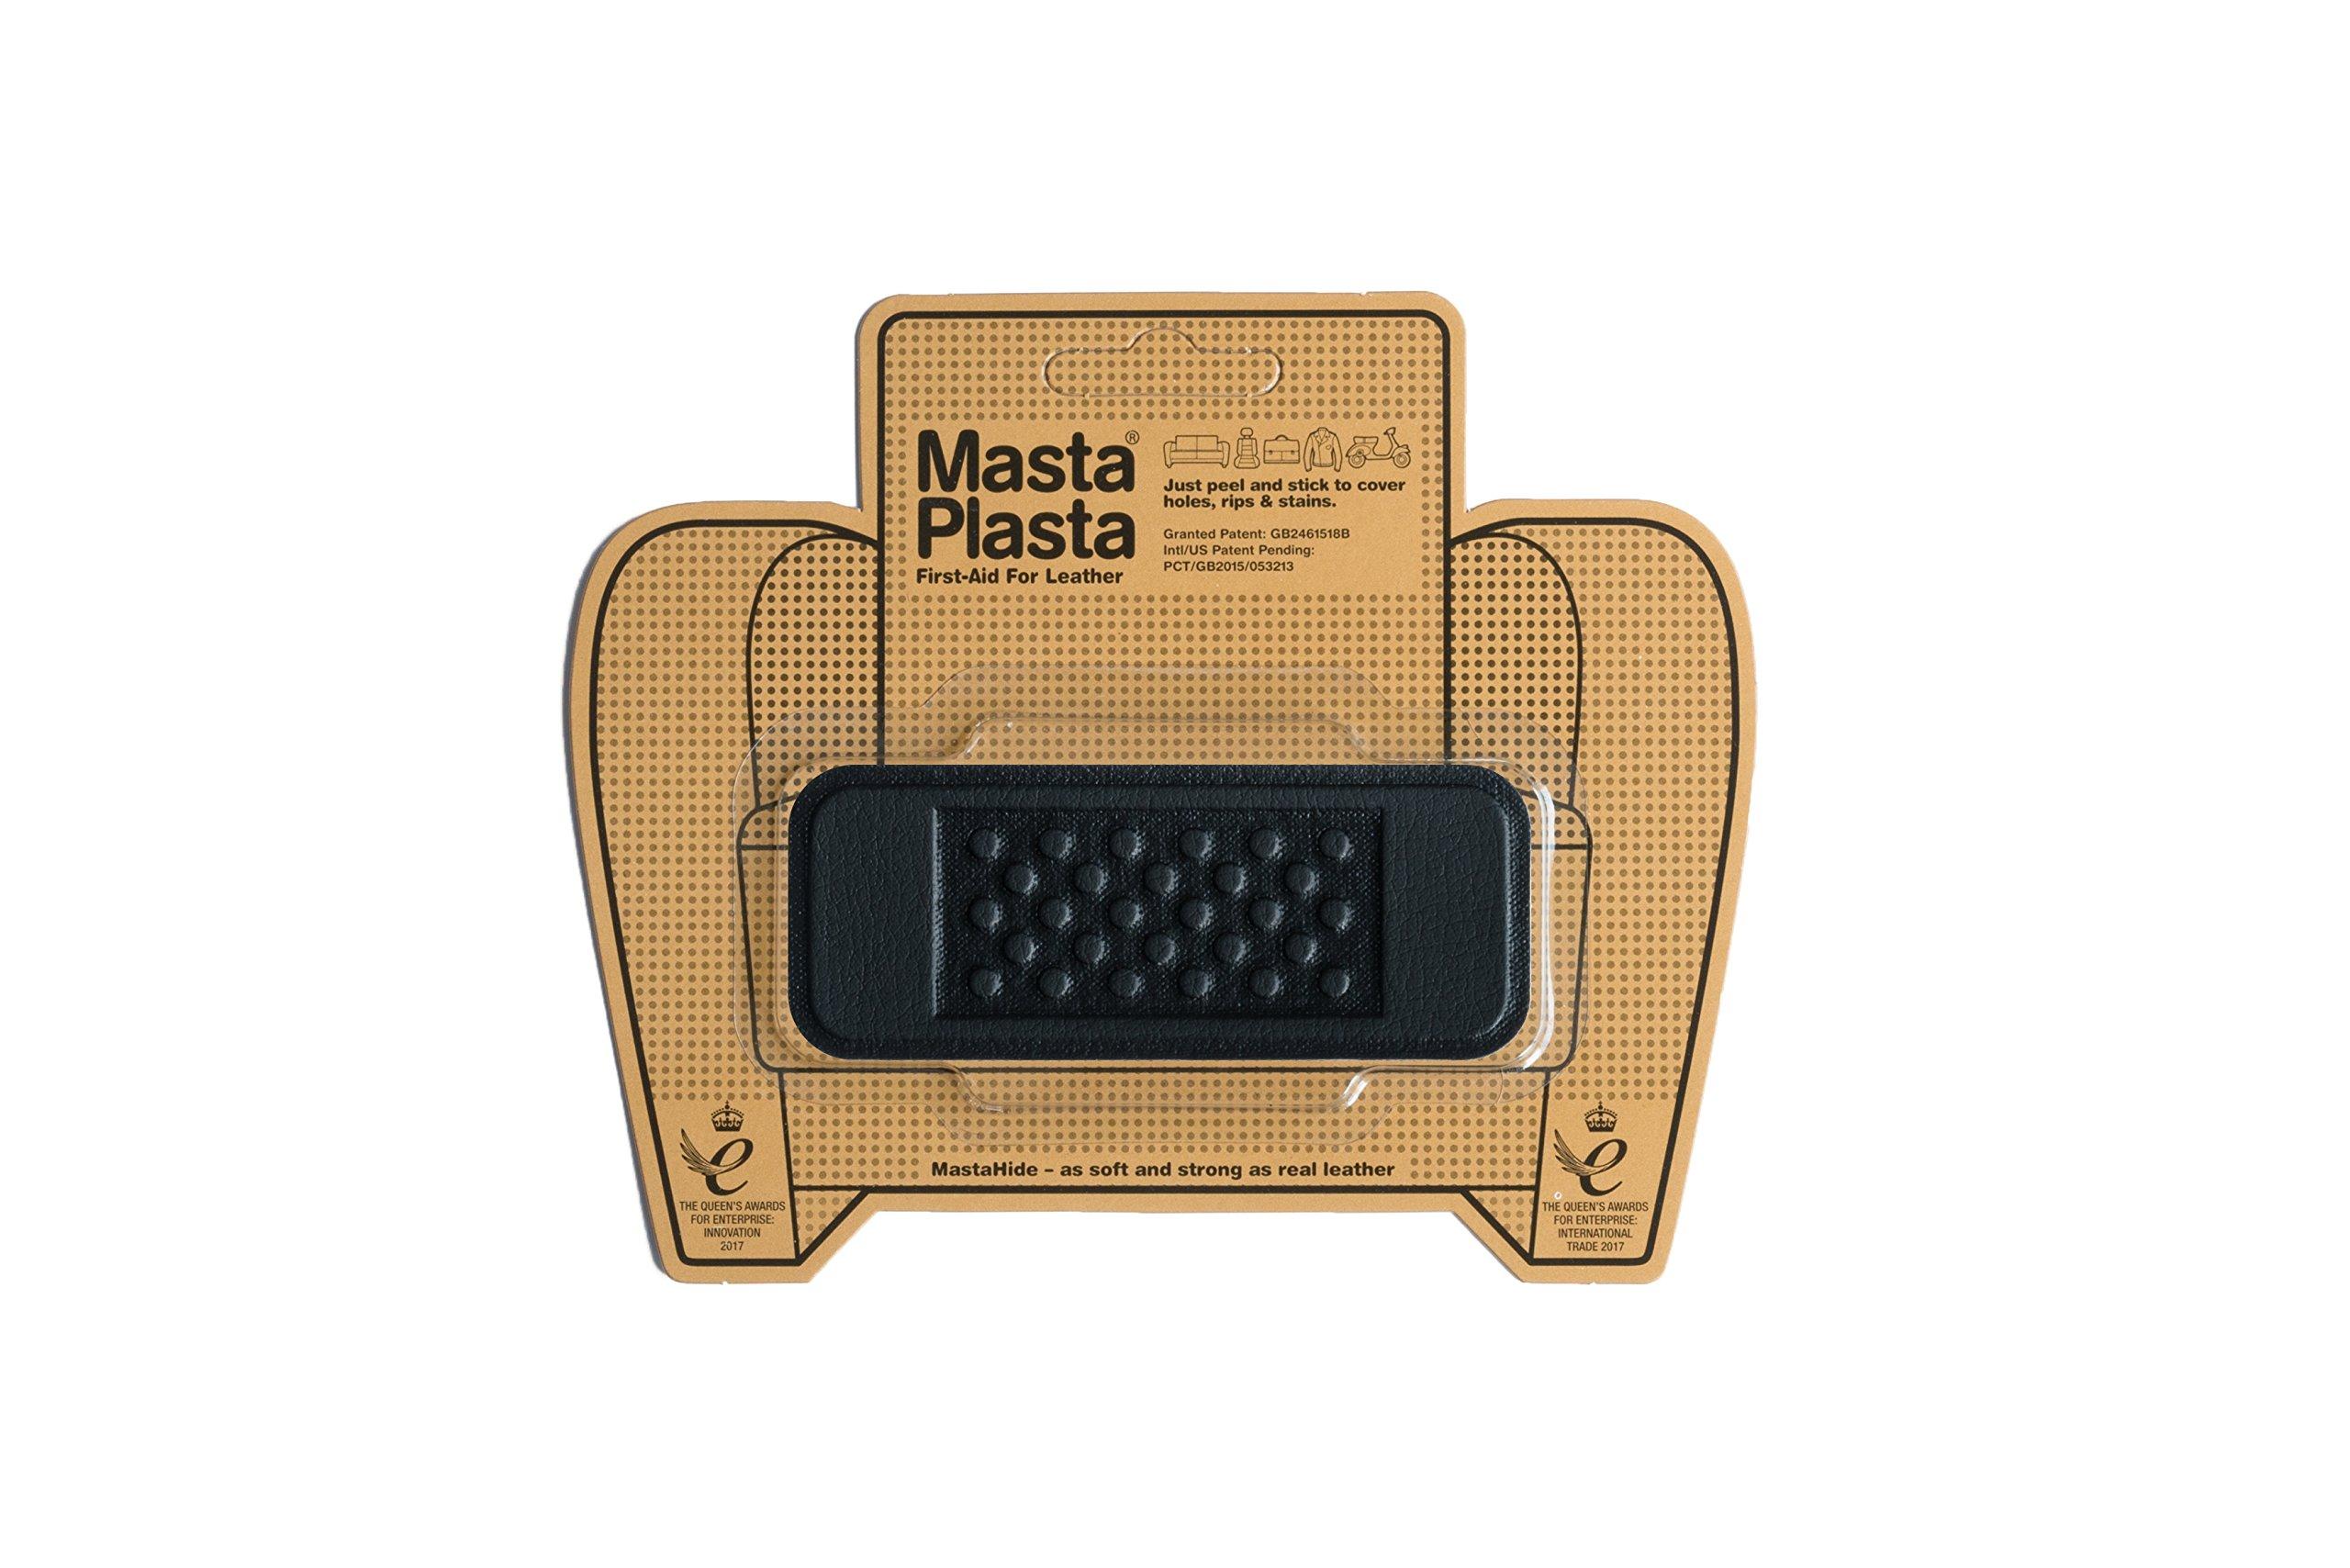 MastaPlasta Self-Adhesive Patch for Leather and Vinyl Repair, Bandage, Black - 4 x 1.5 Inch by MASTAPLASTA